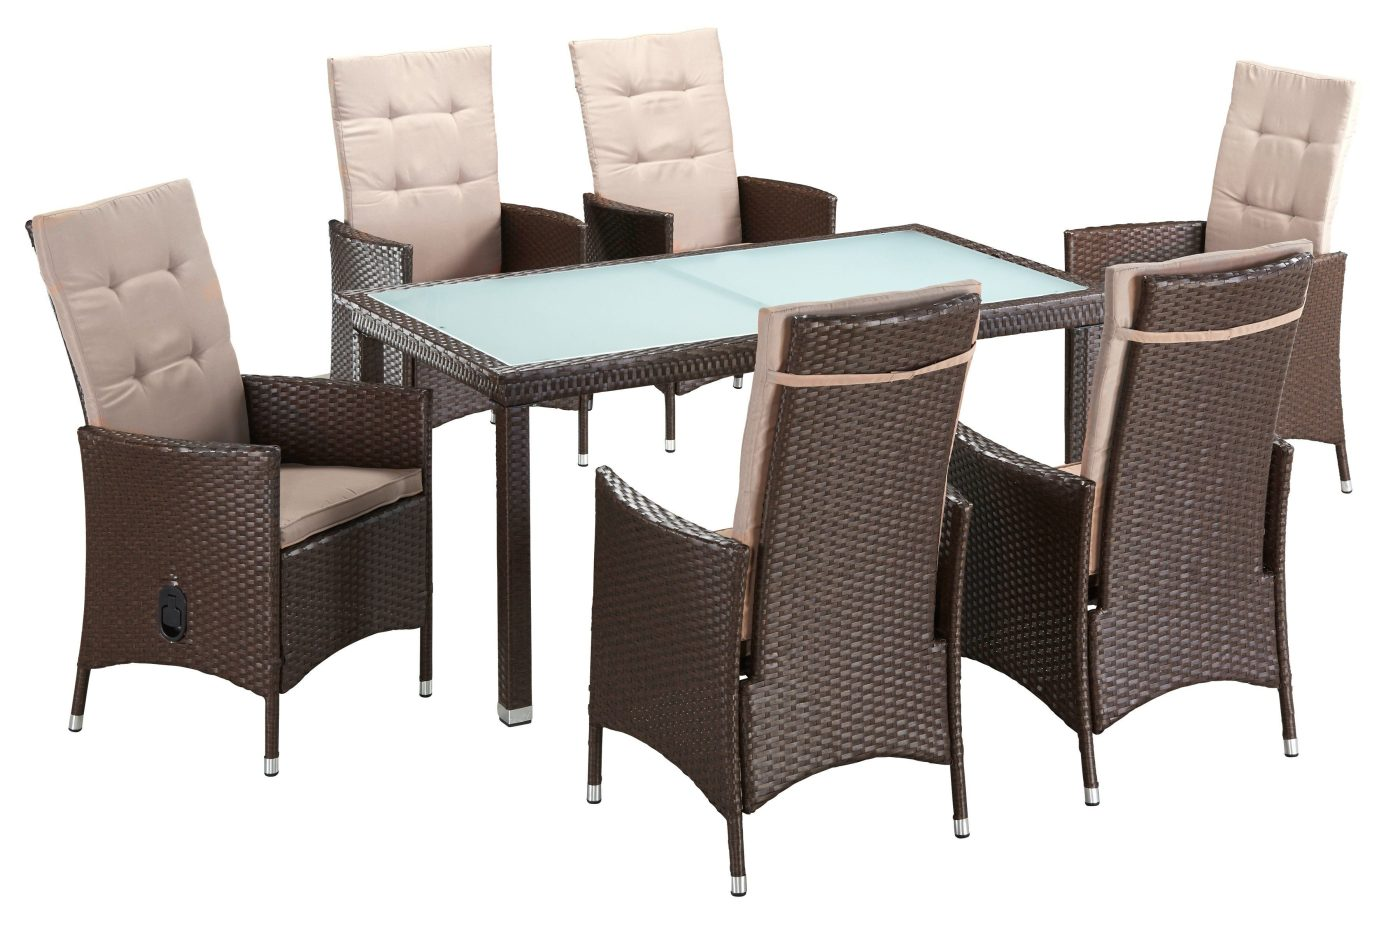 33 sparen gartenm bel set madeira 13 teilig nur 399 99 cherry m bel otto. Black Bedroom Furniture Sets. Home Design Ideas